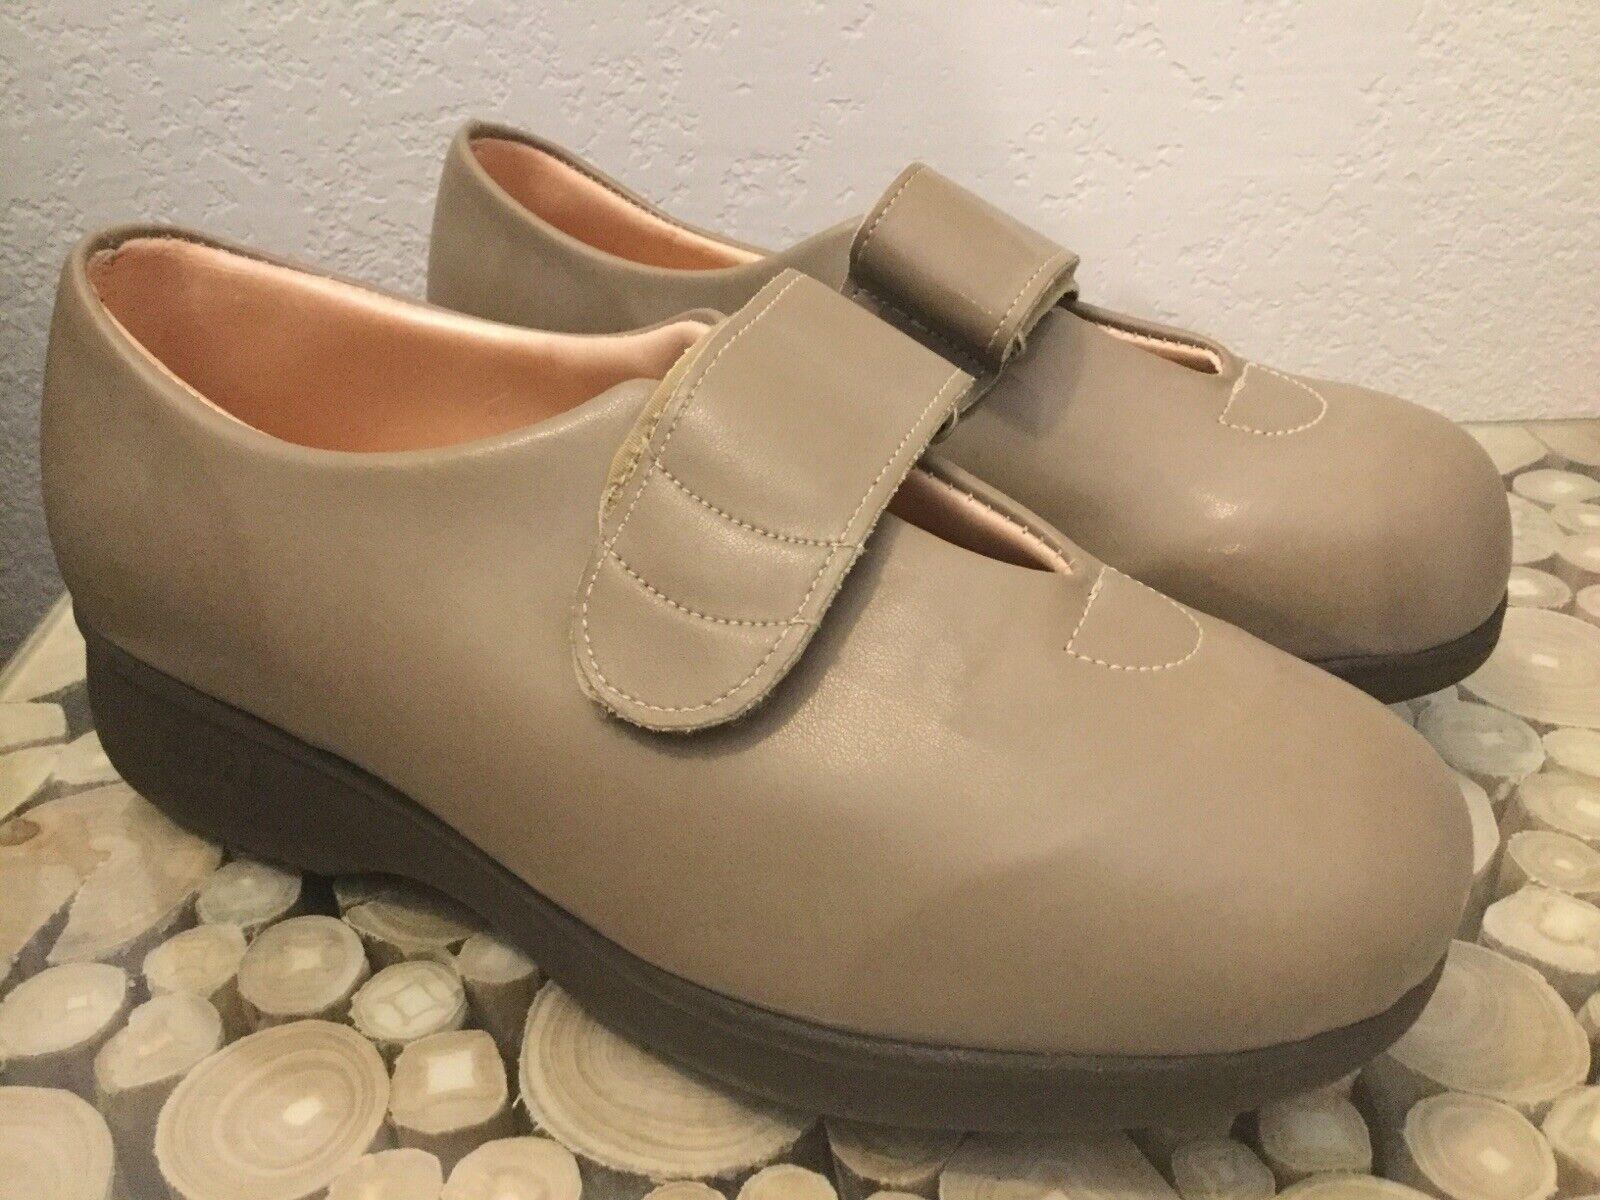 Women's Apex Ambulator Laced Diabetic Mary Jane Beige Comfort Shoes US 9